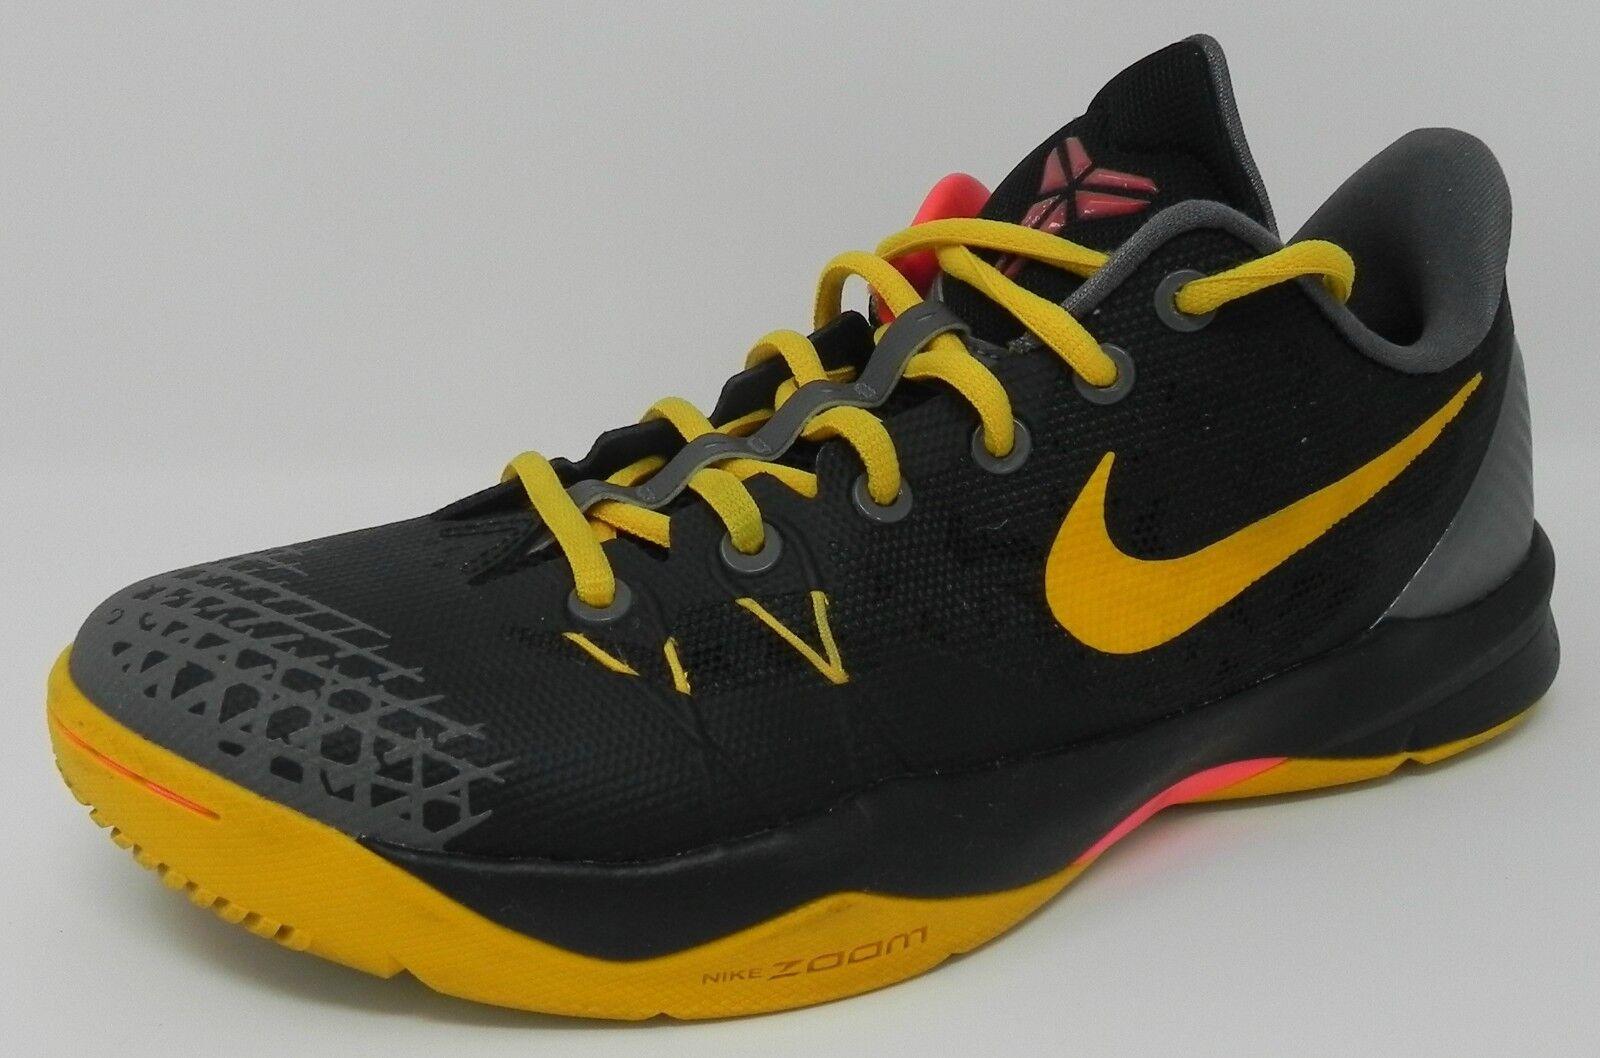 Men's Nike 10.5 Zoom Kobe Venomenon 4 Bruce Lee Shoes 10.5 Nike Rare Excellent Condition 49f44b